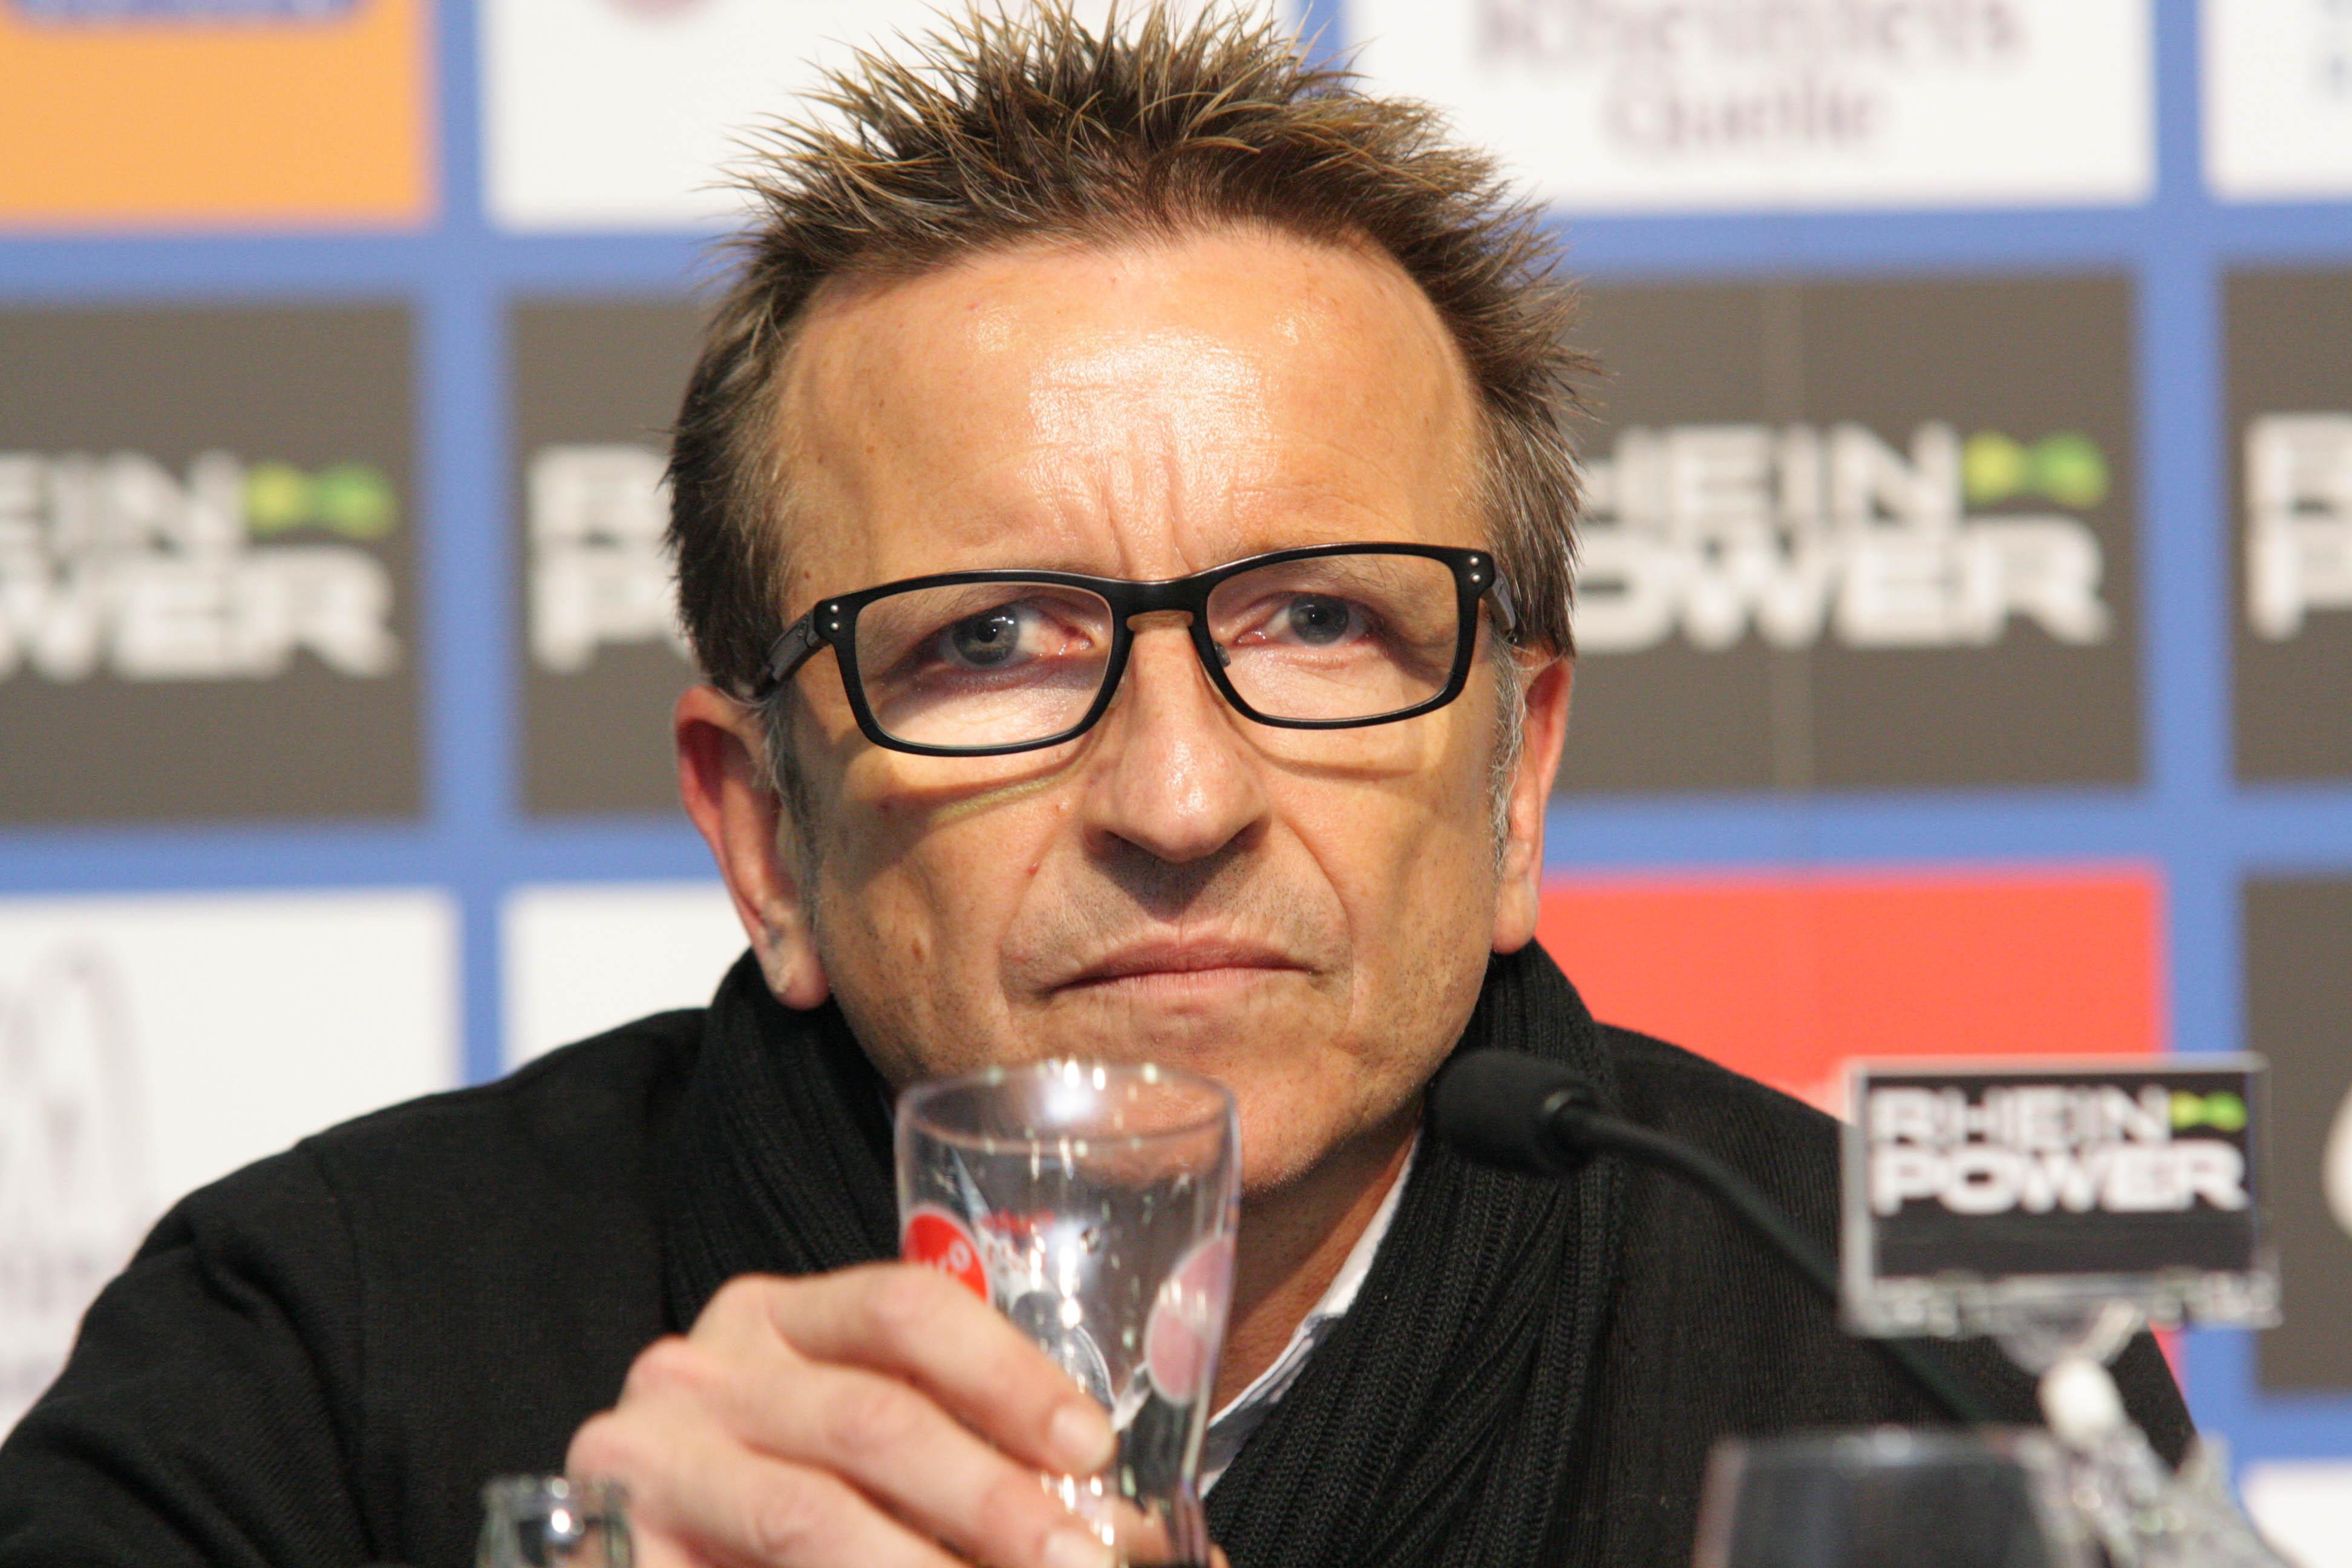 Meier at a press conference with [[Fortuna Düsseldorf Düsseldorf]] in 2011